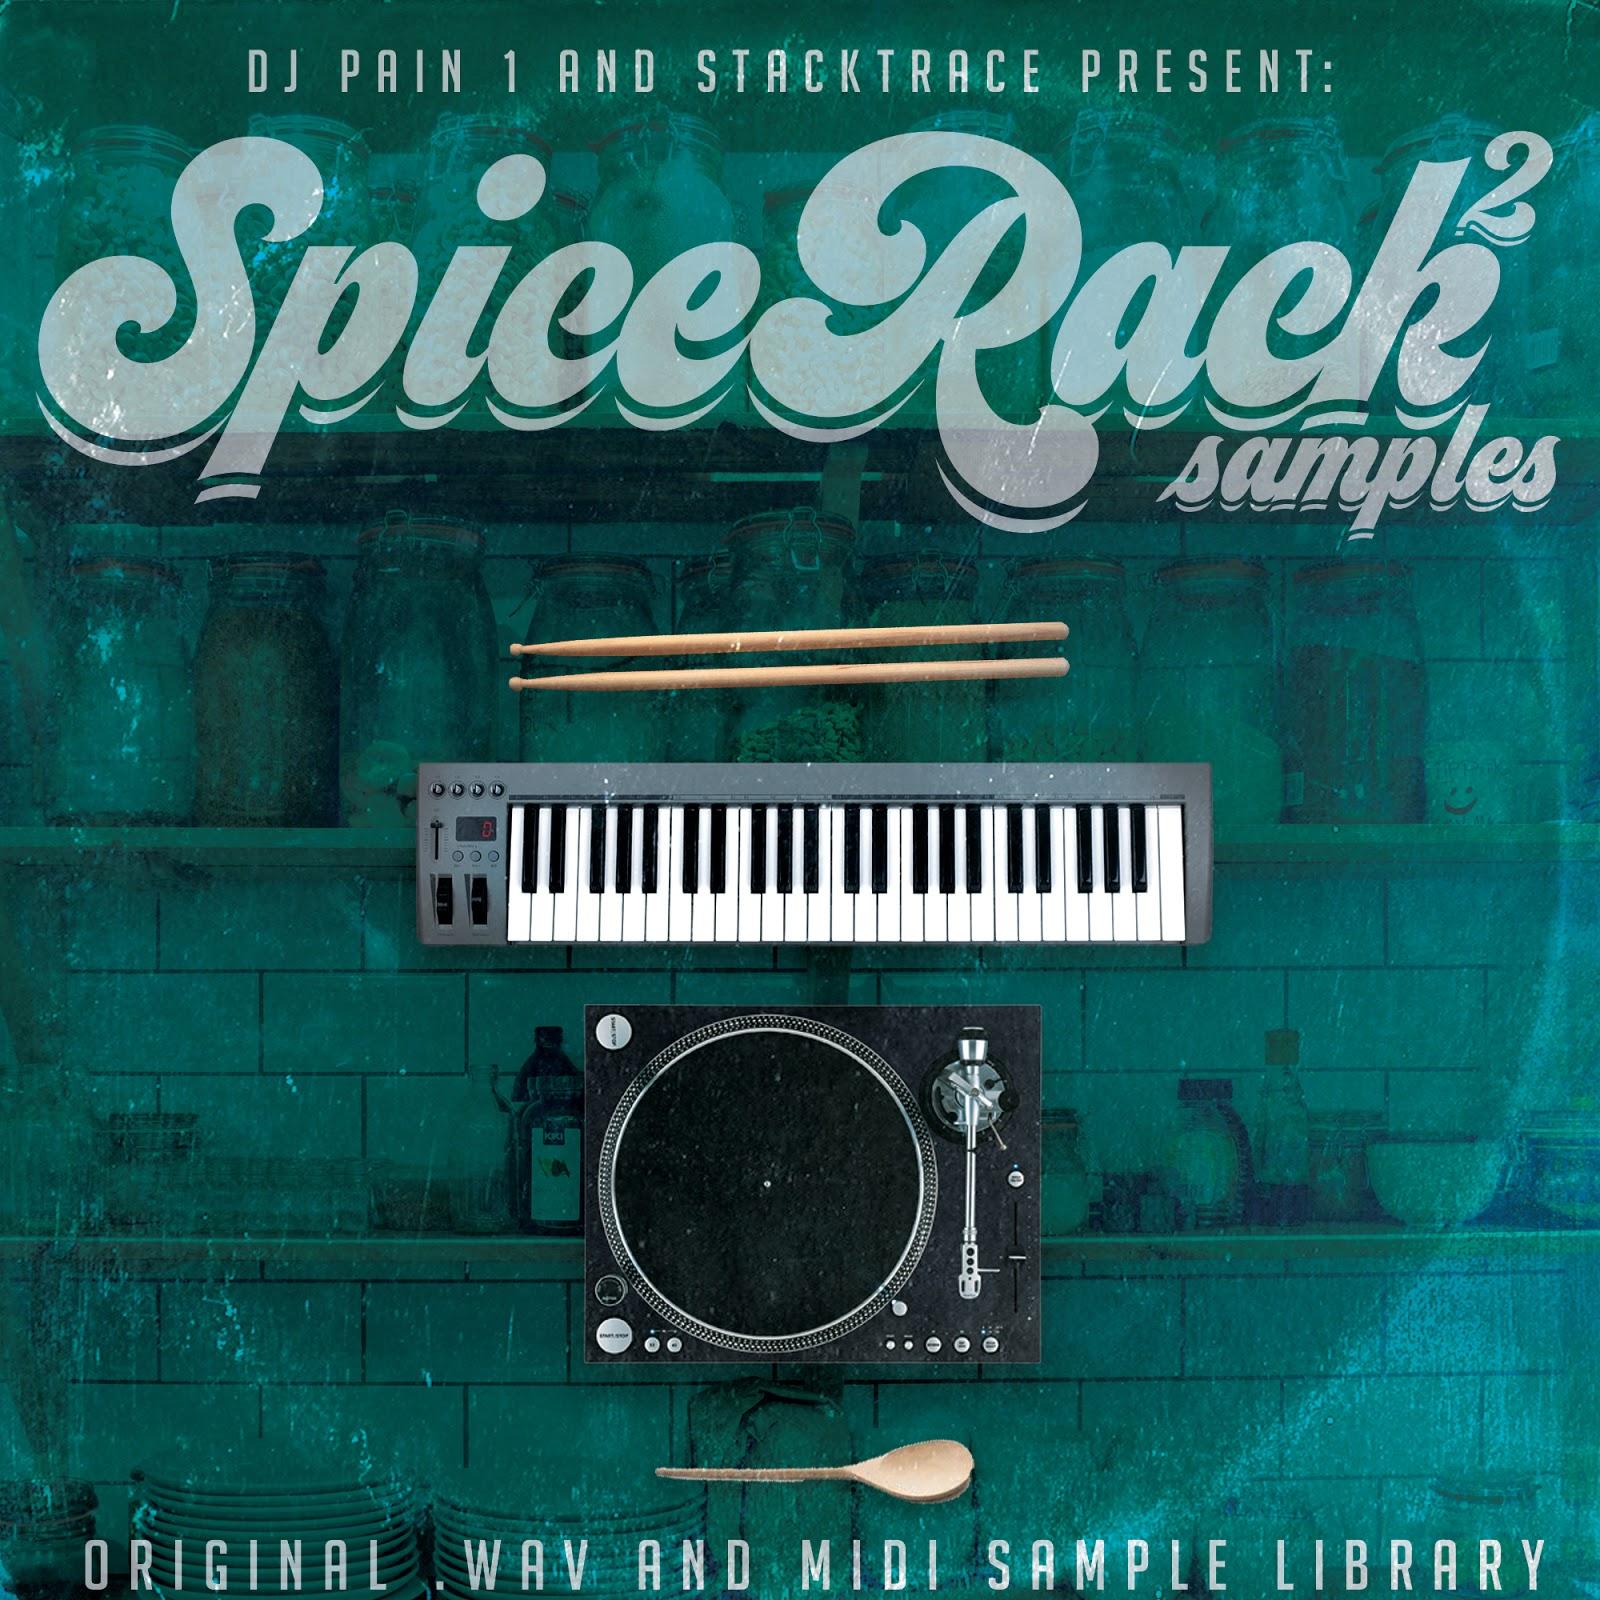 DJ Pain 1: Free Sample Packs 2019 - Spice Rack Samples - Free MIDI